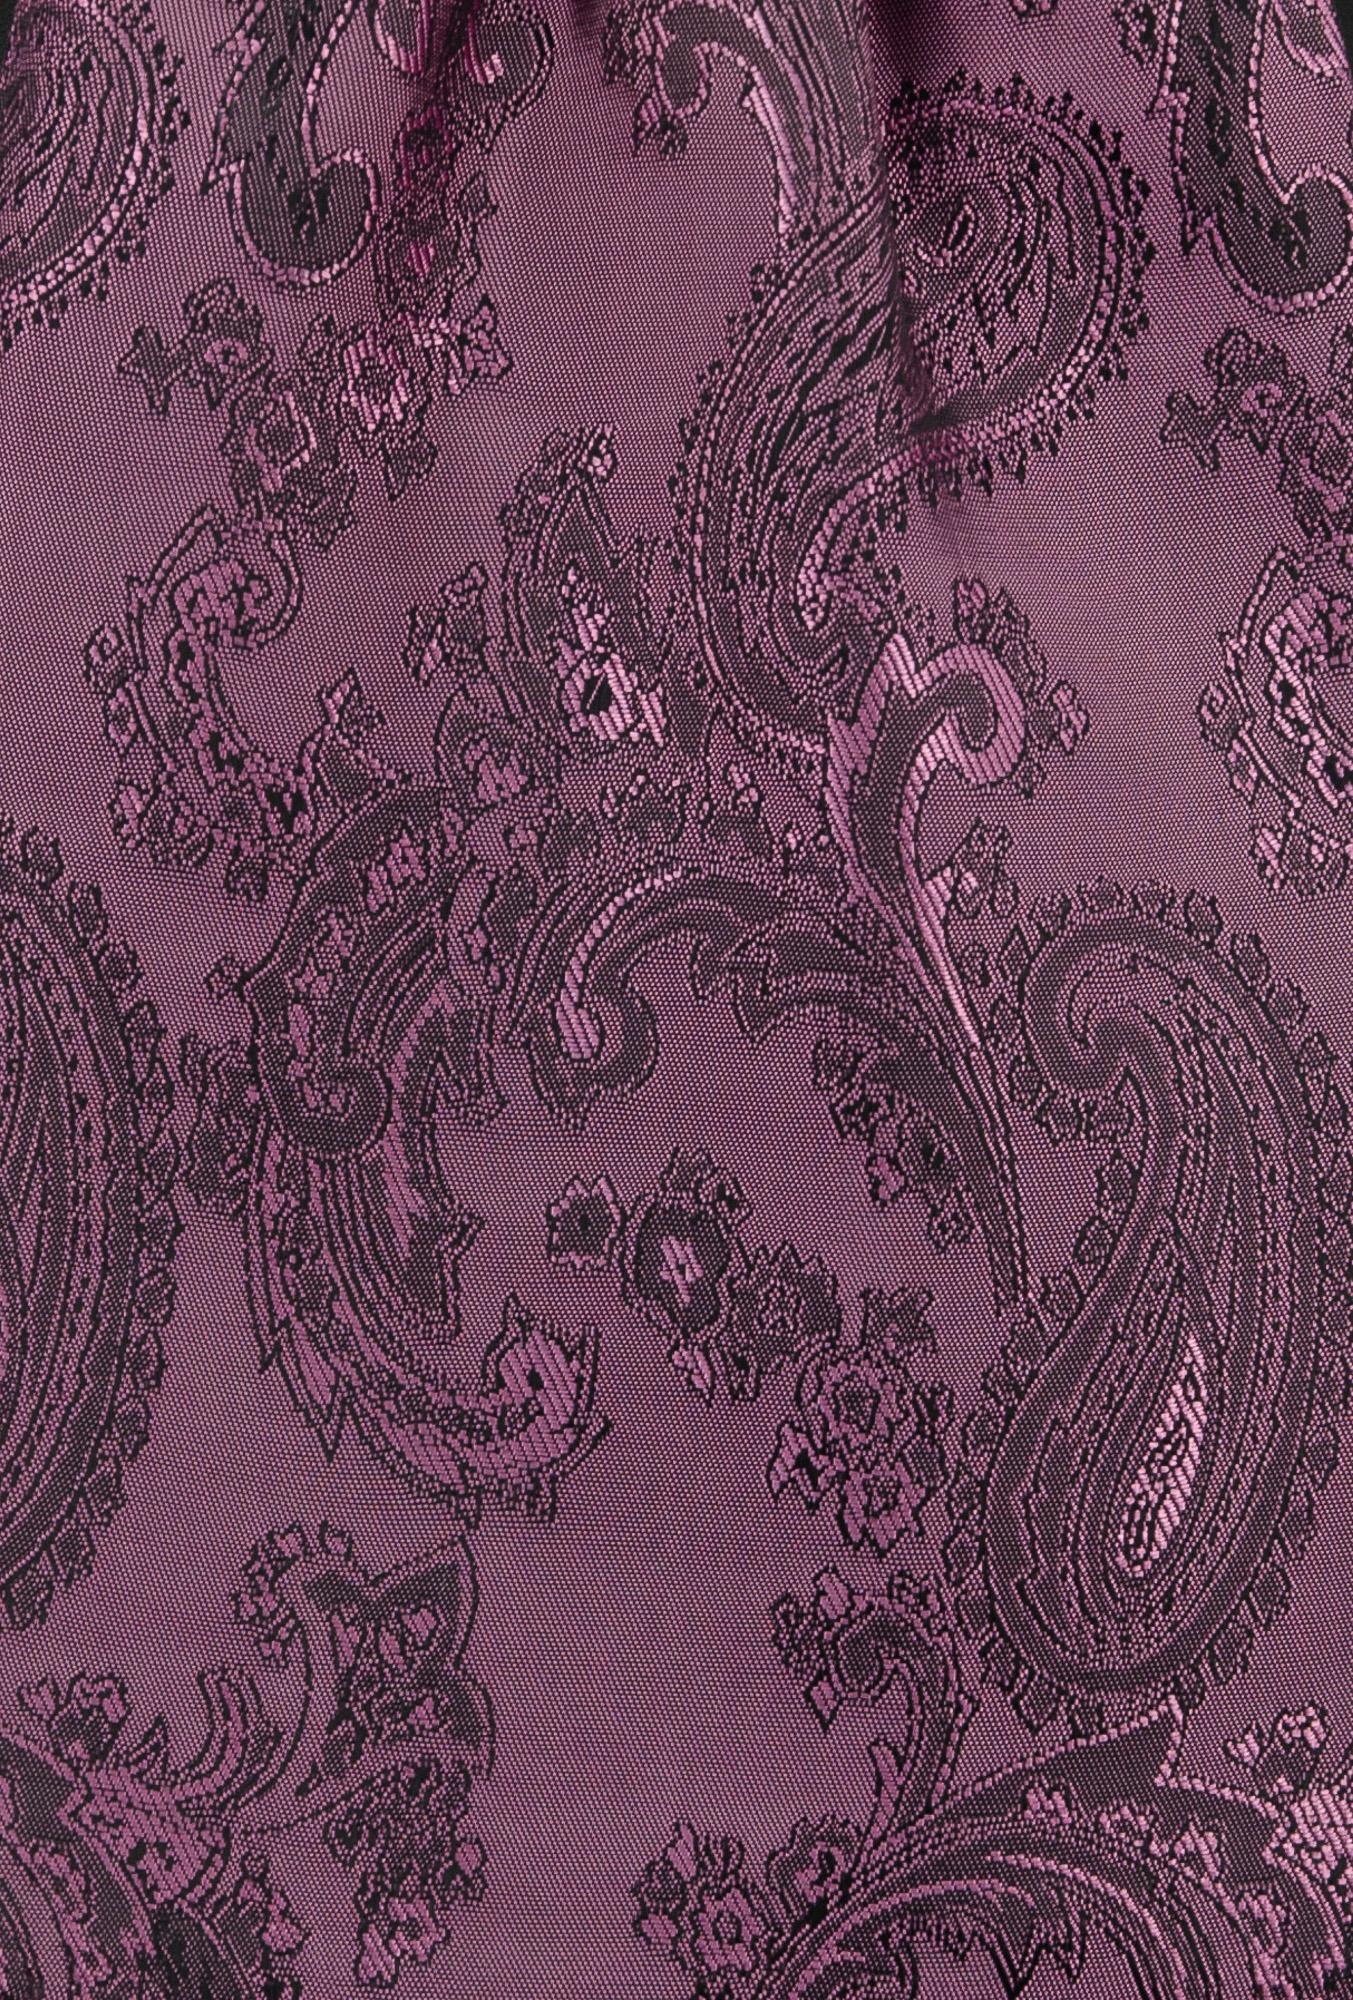 Pink/Lilac Paisley (34)